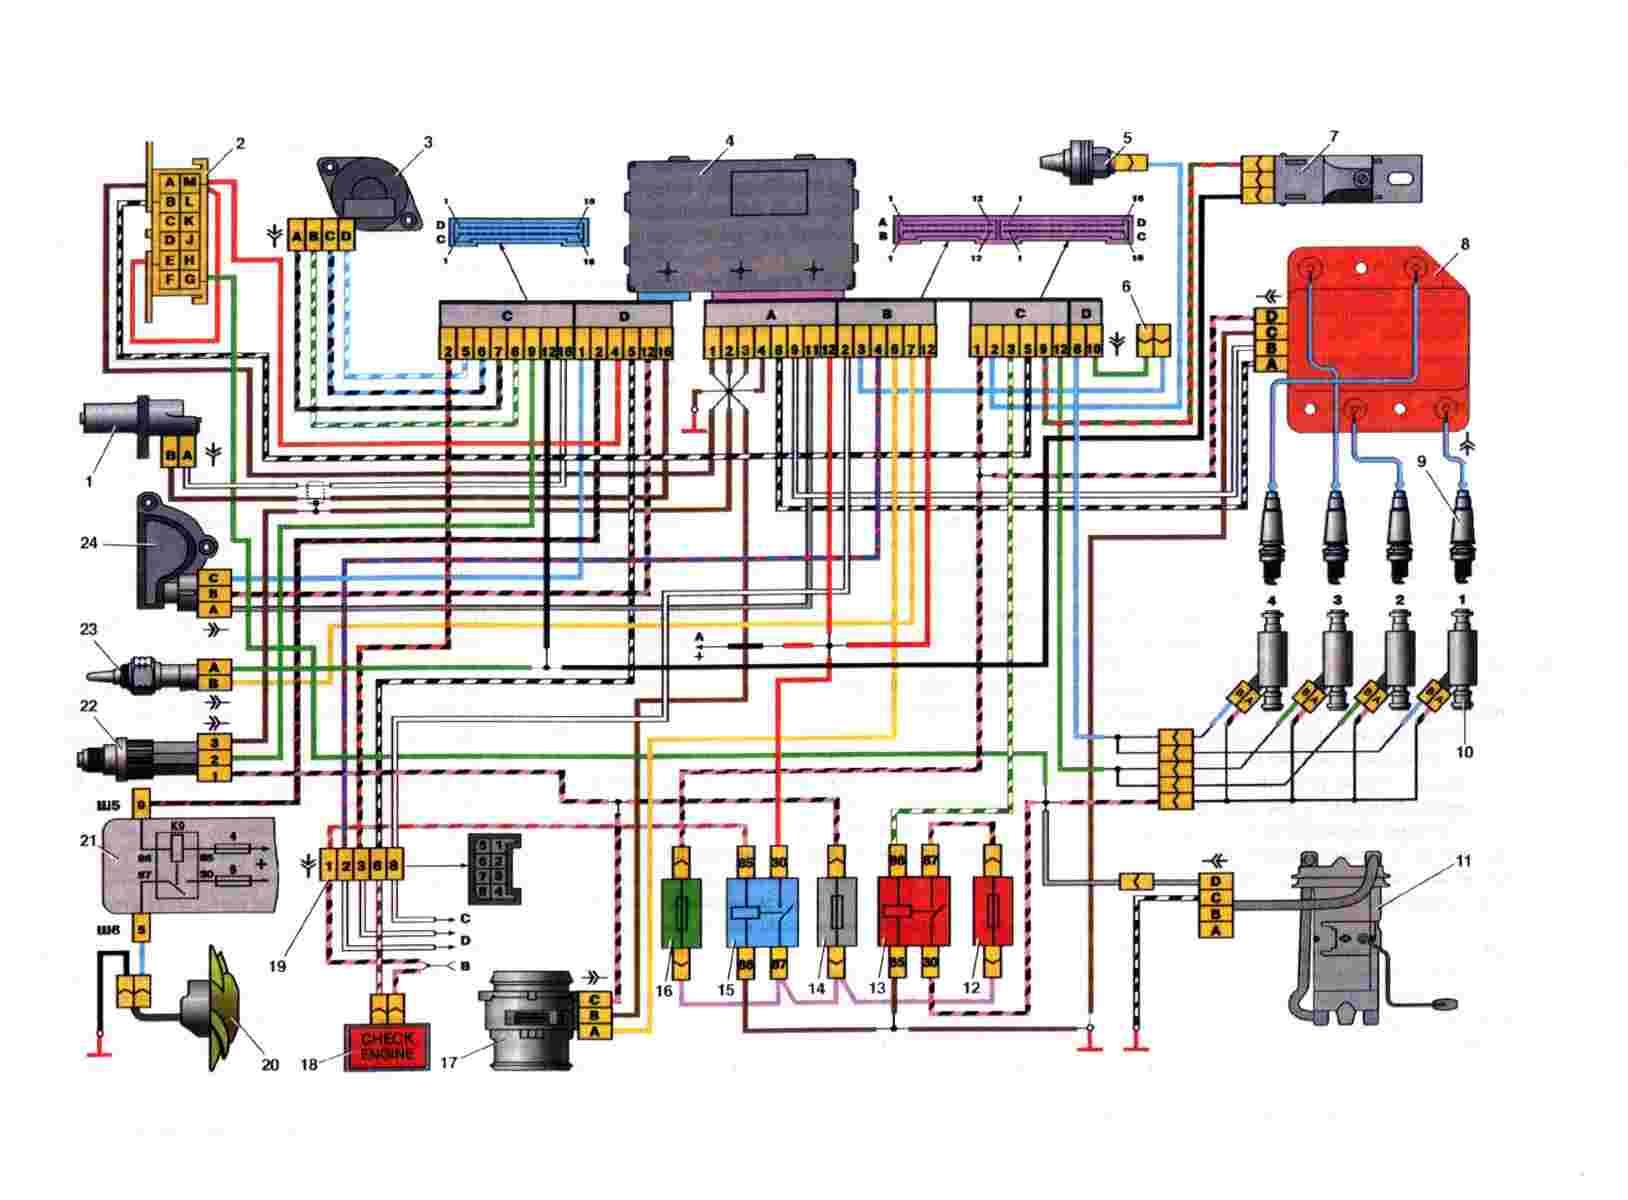 Фото №5 - ВАЗ 2110 инжектор схема